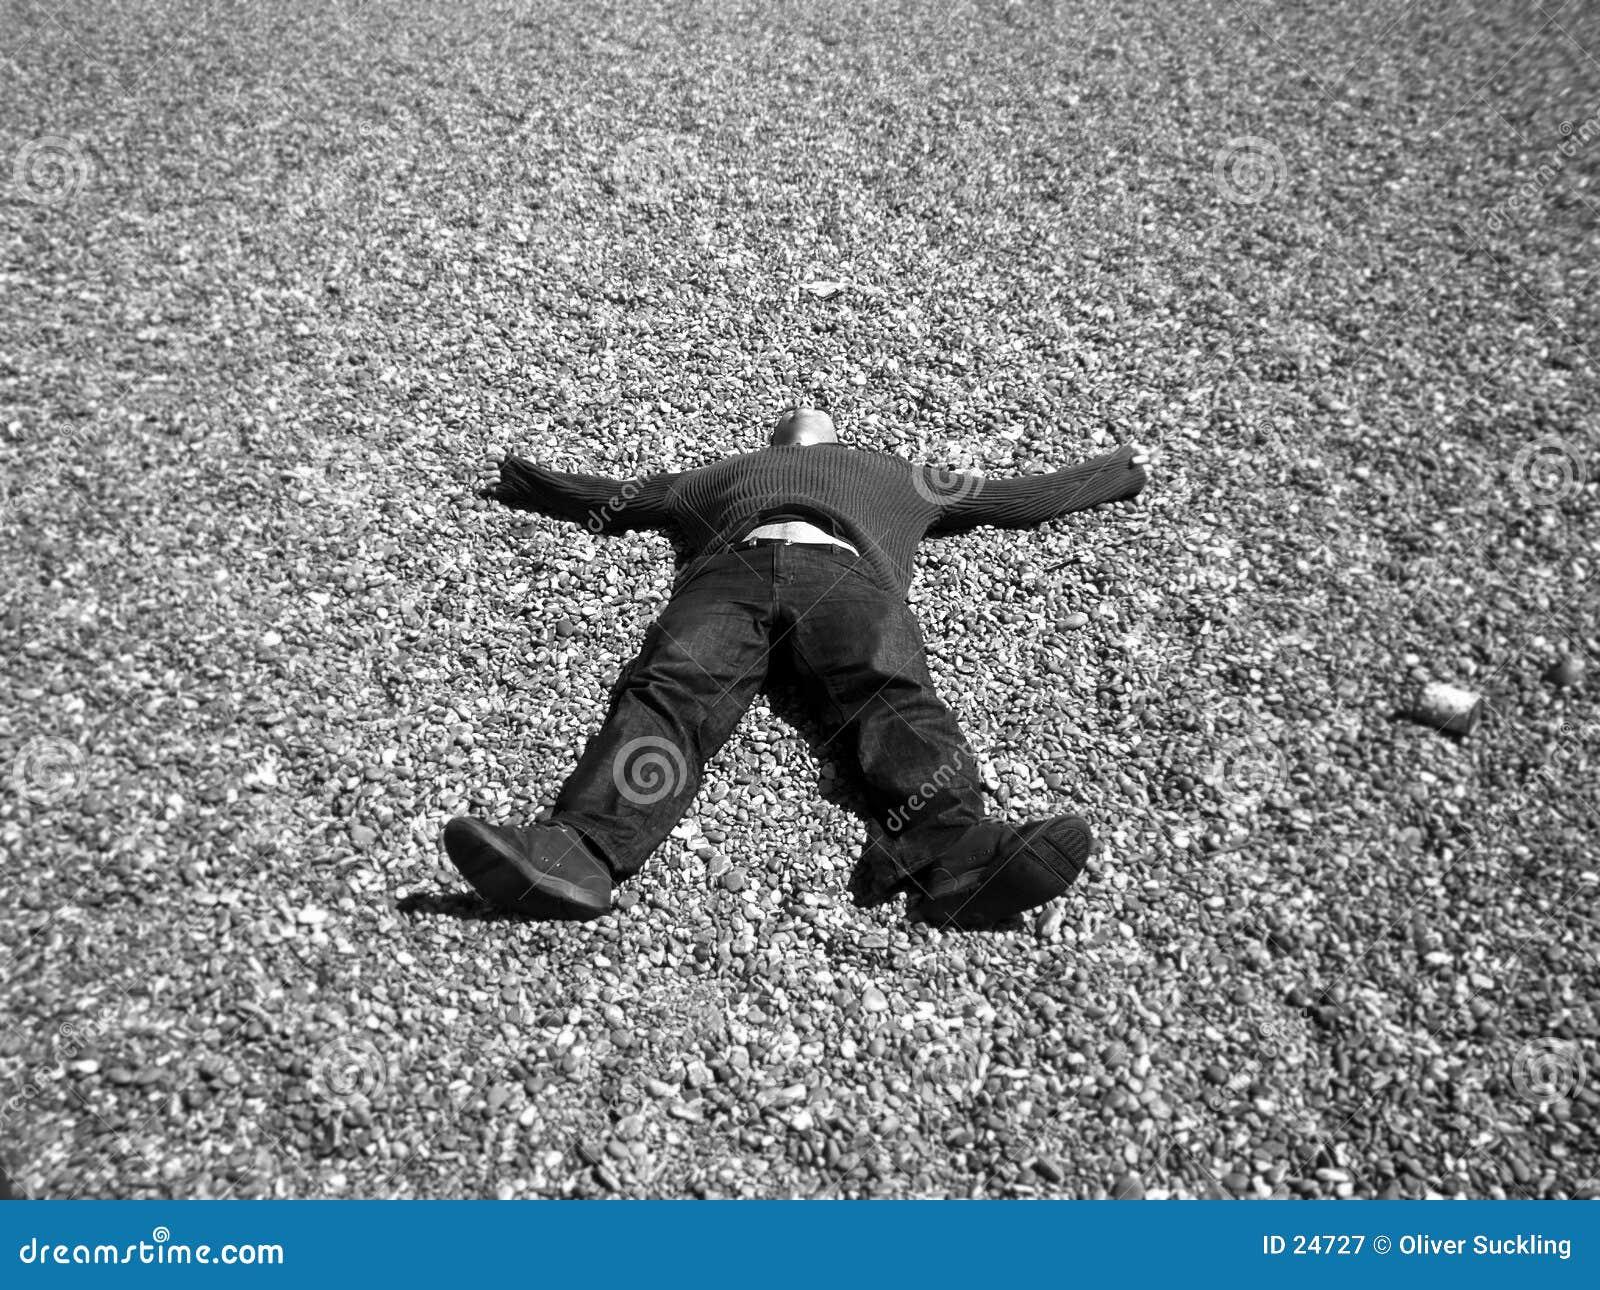 A man lying on stones